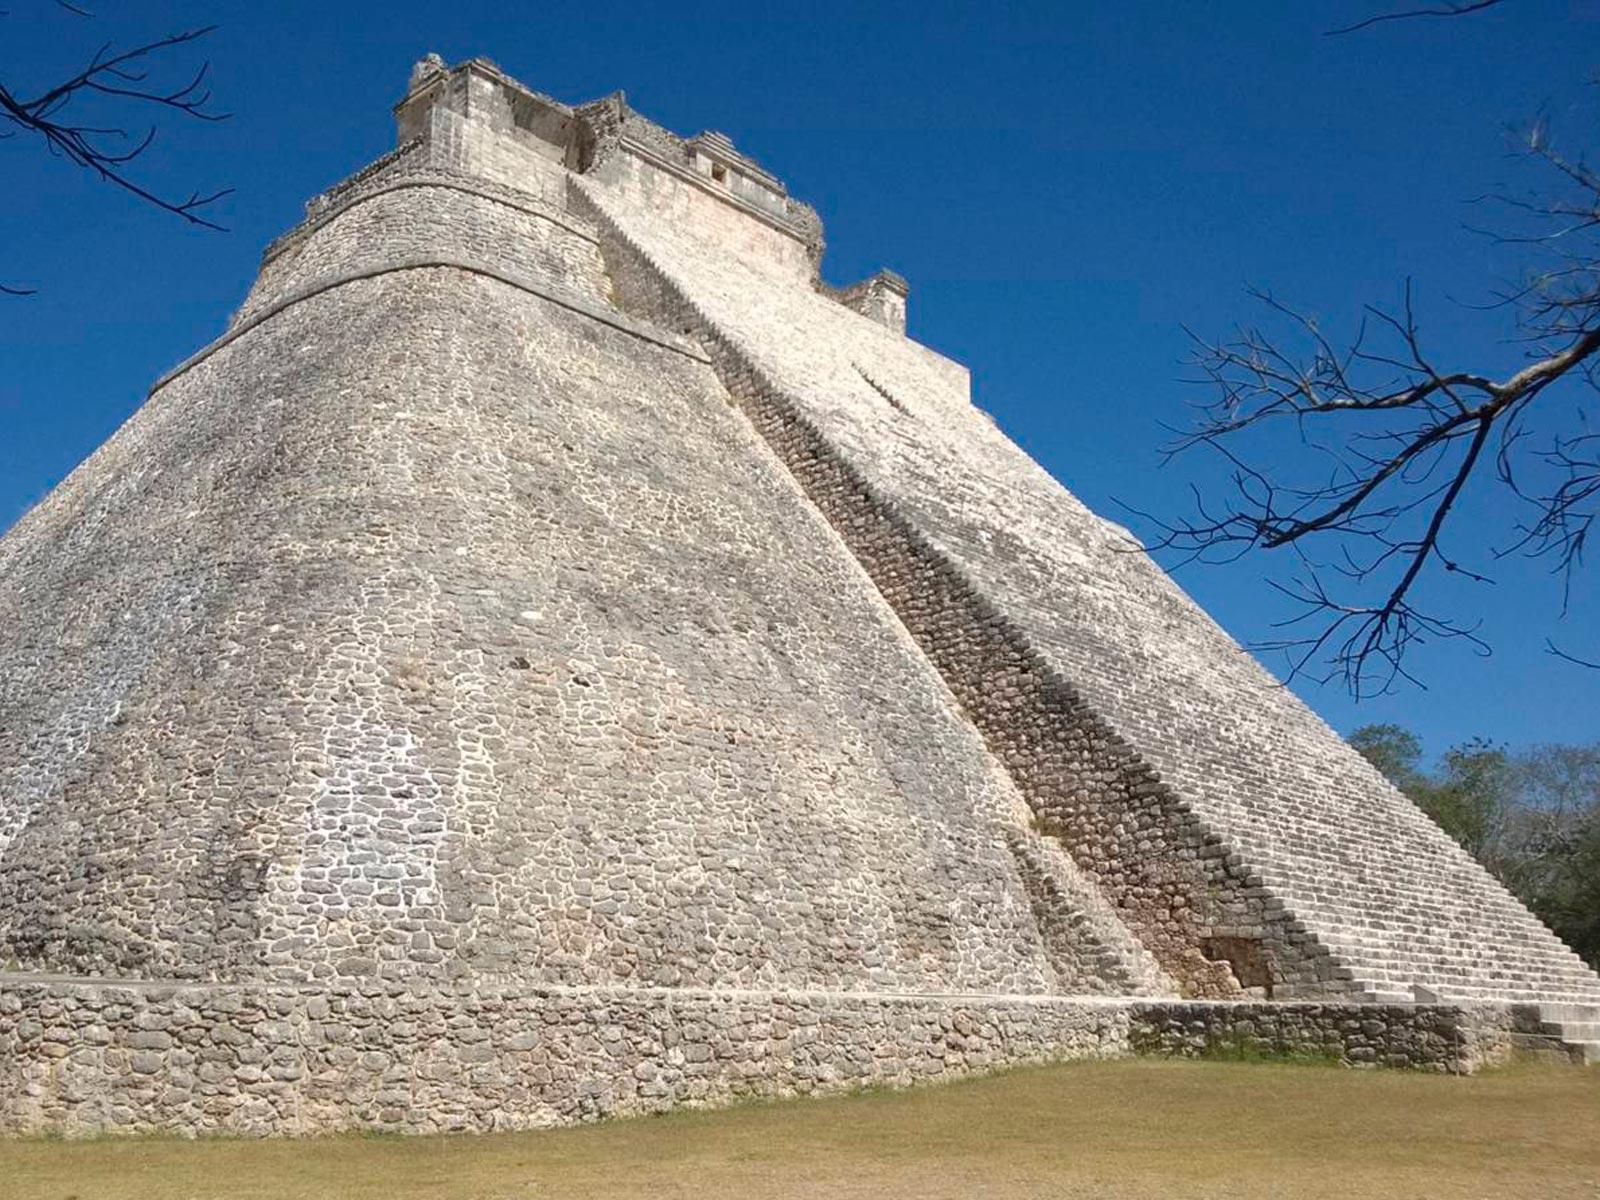 Messico-mexico-piramide-maya-calakmul